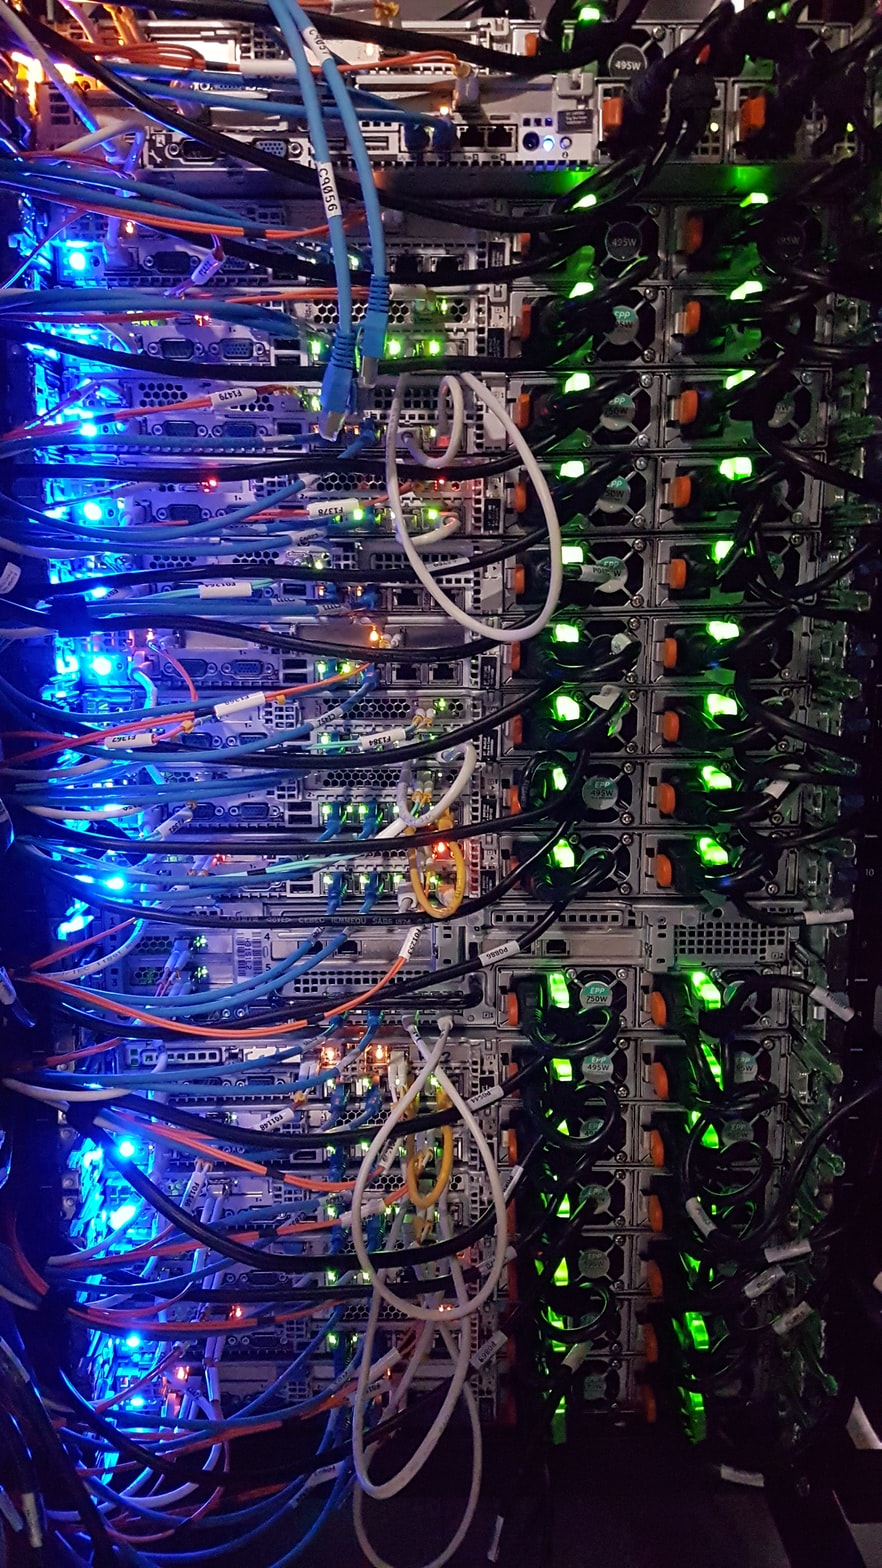 supercomputer image